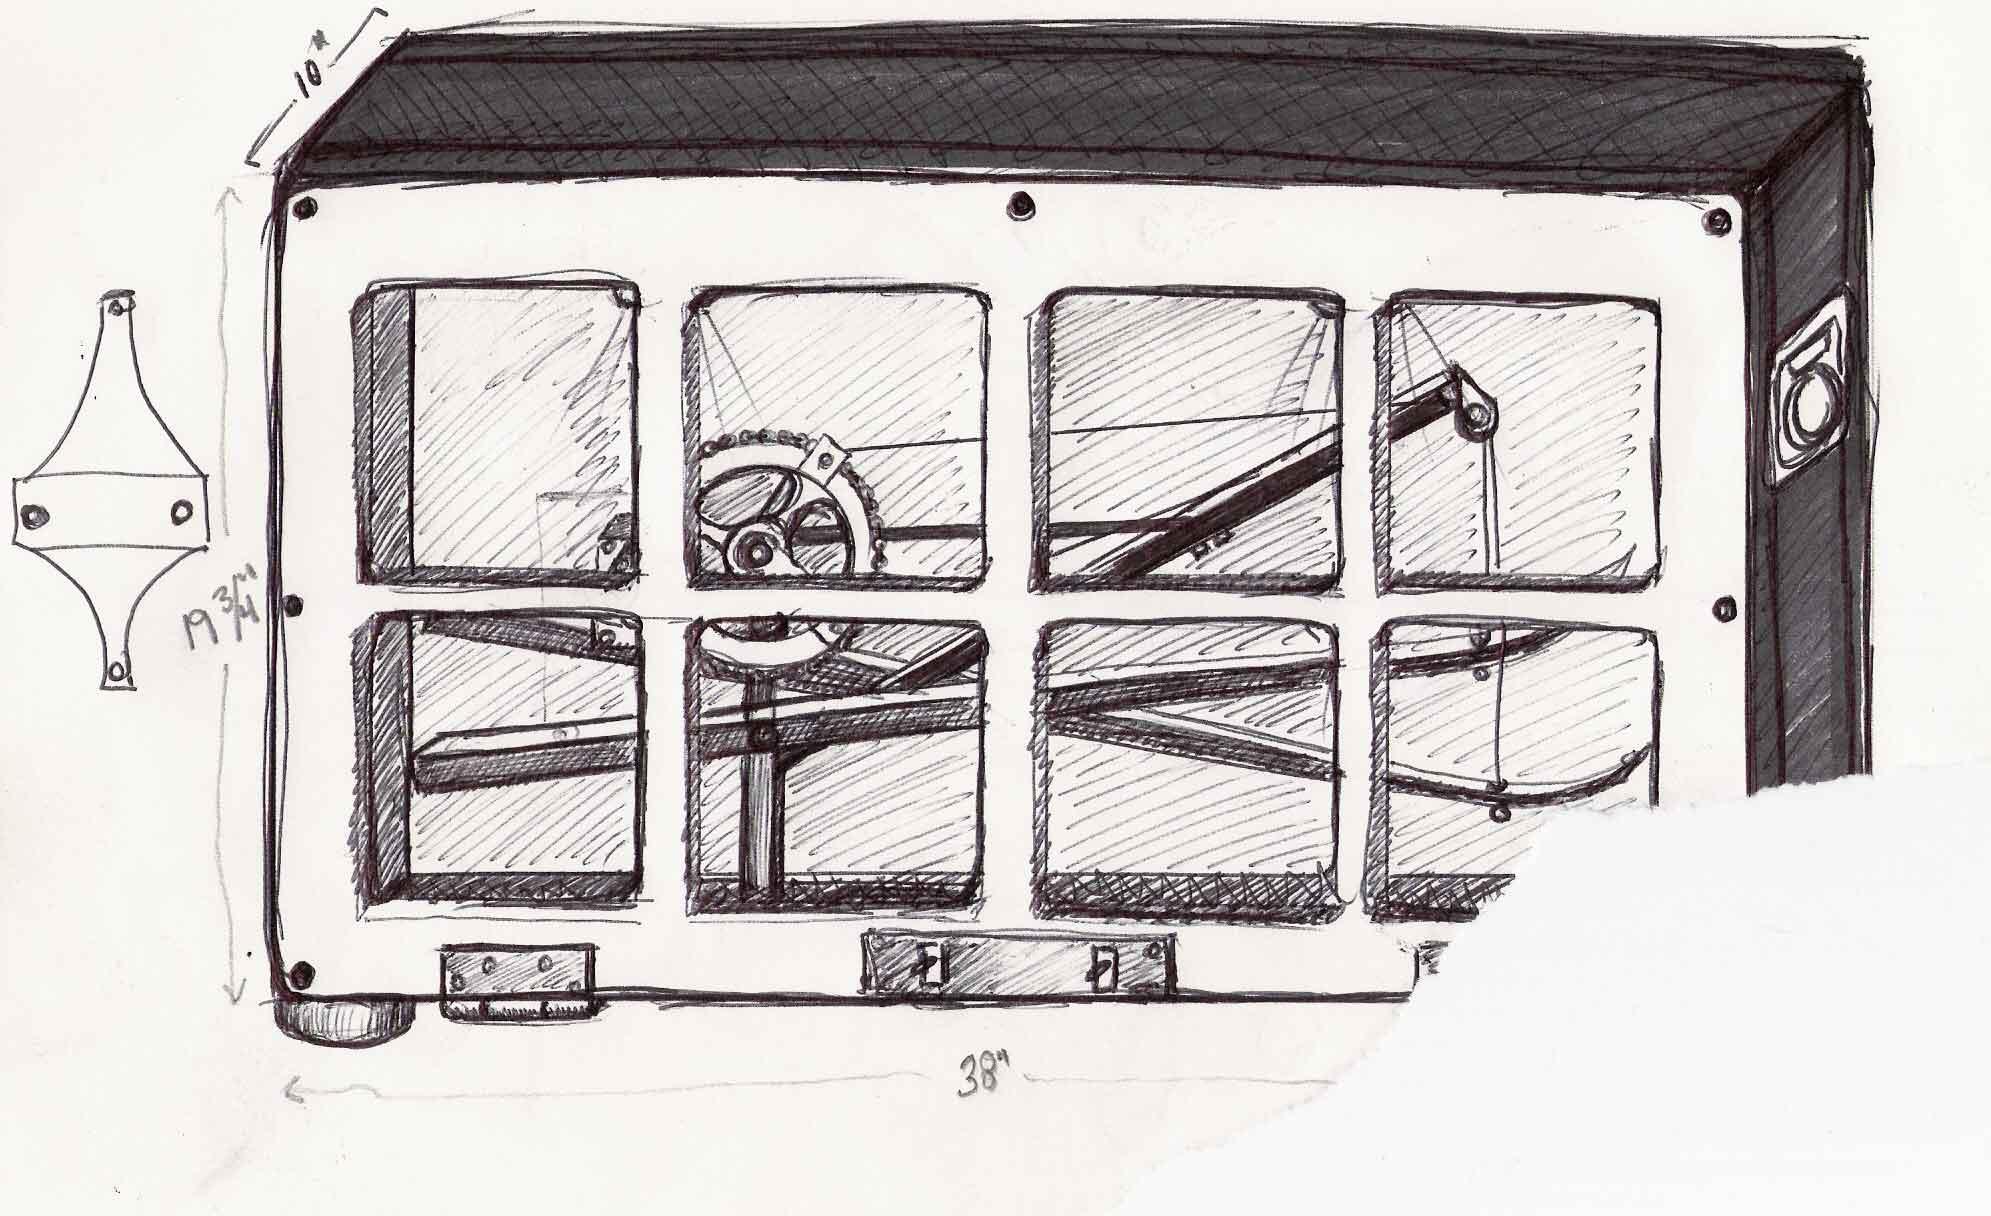 sketch-8-sept-05.jpg